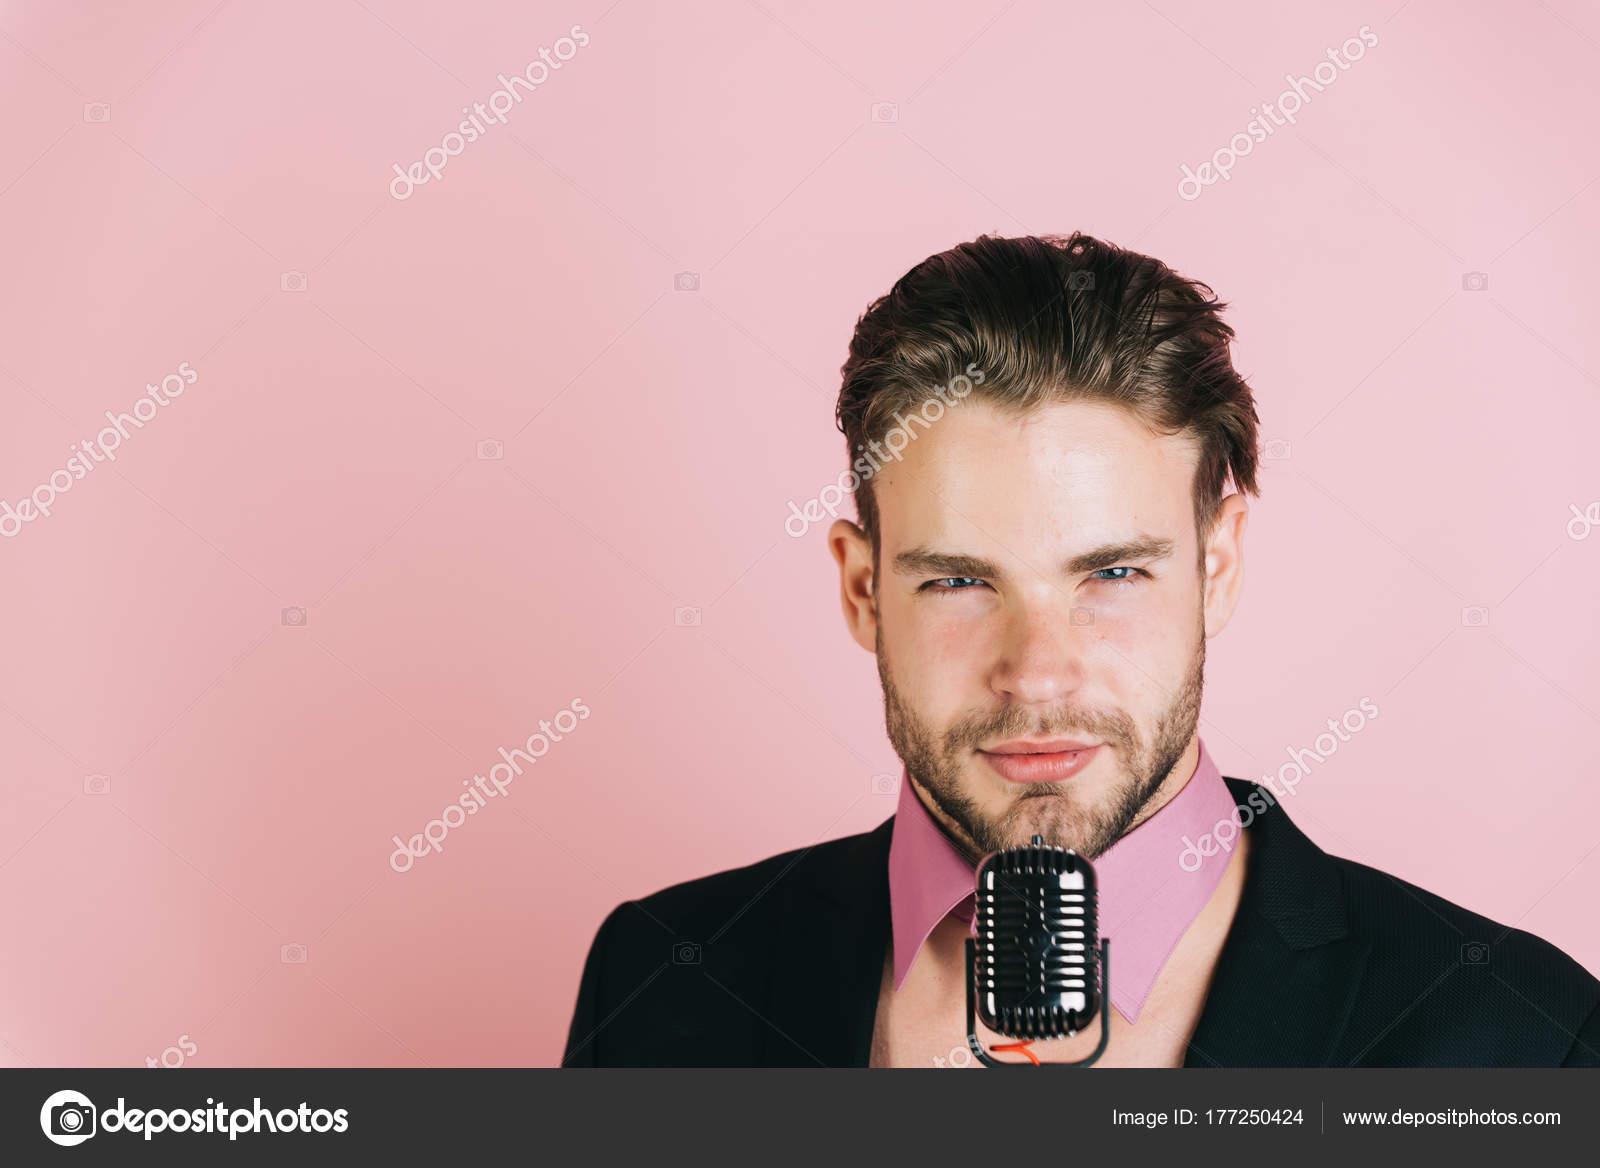 giovane DJ su sfondo rosa 4042c70b8f8c